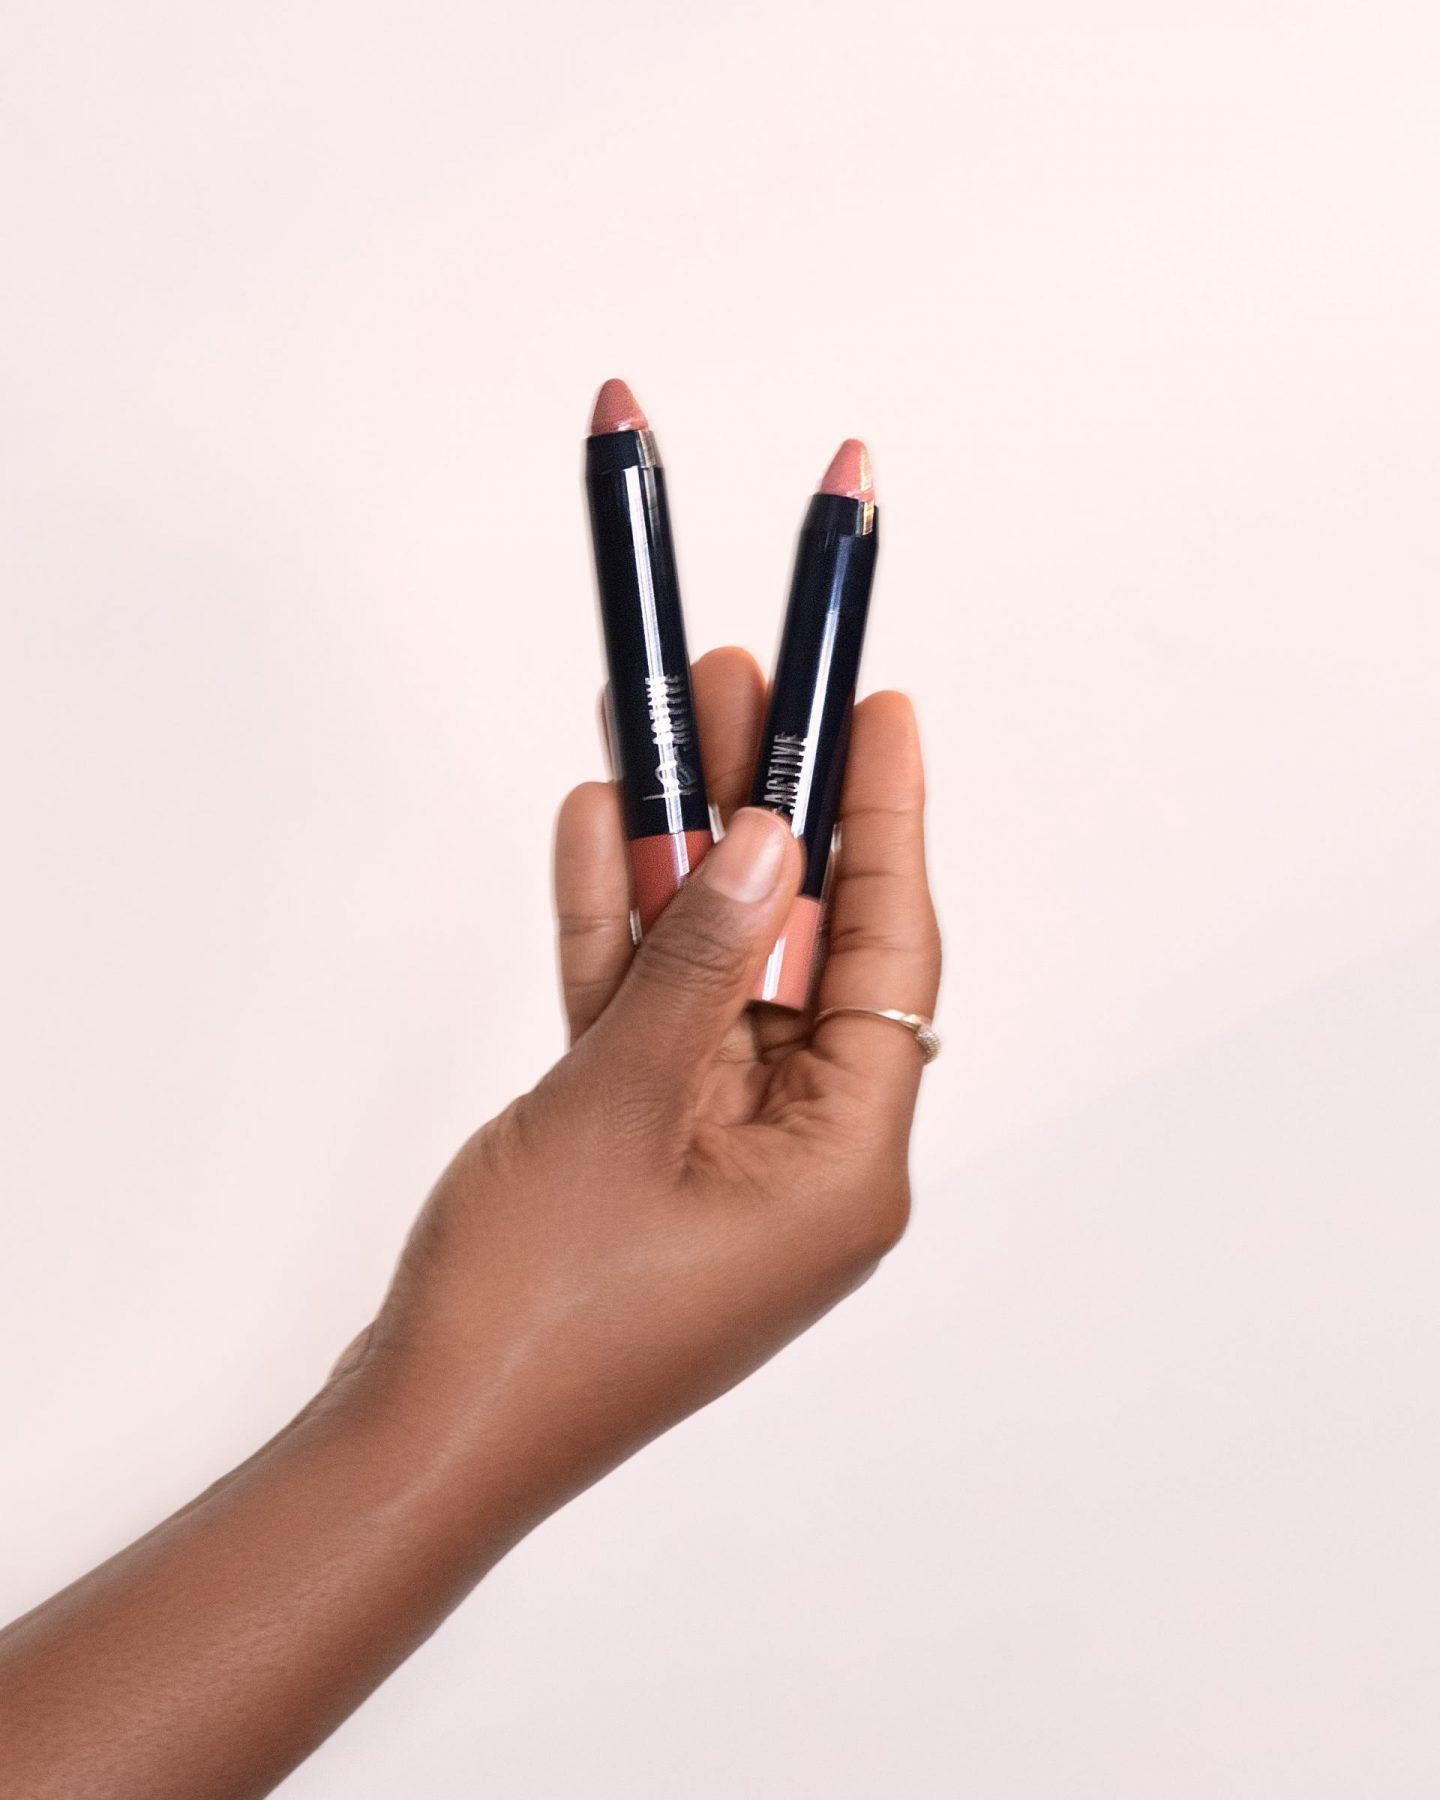 Kaye Bassey holding One Click Beauty matte lip crayon and sheer lip crayon - perfect nudes beauty kit